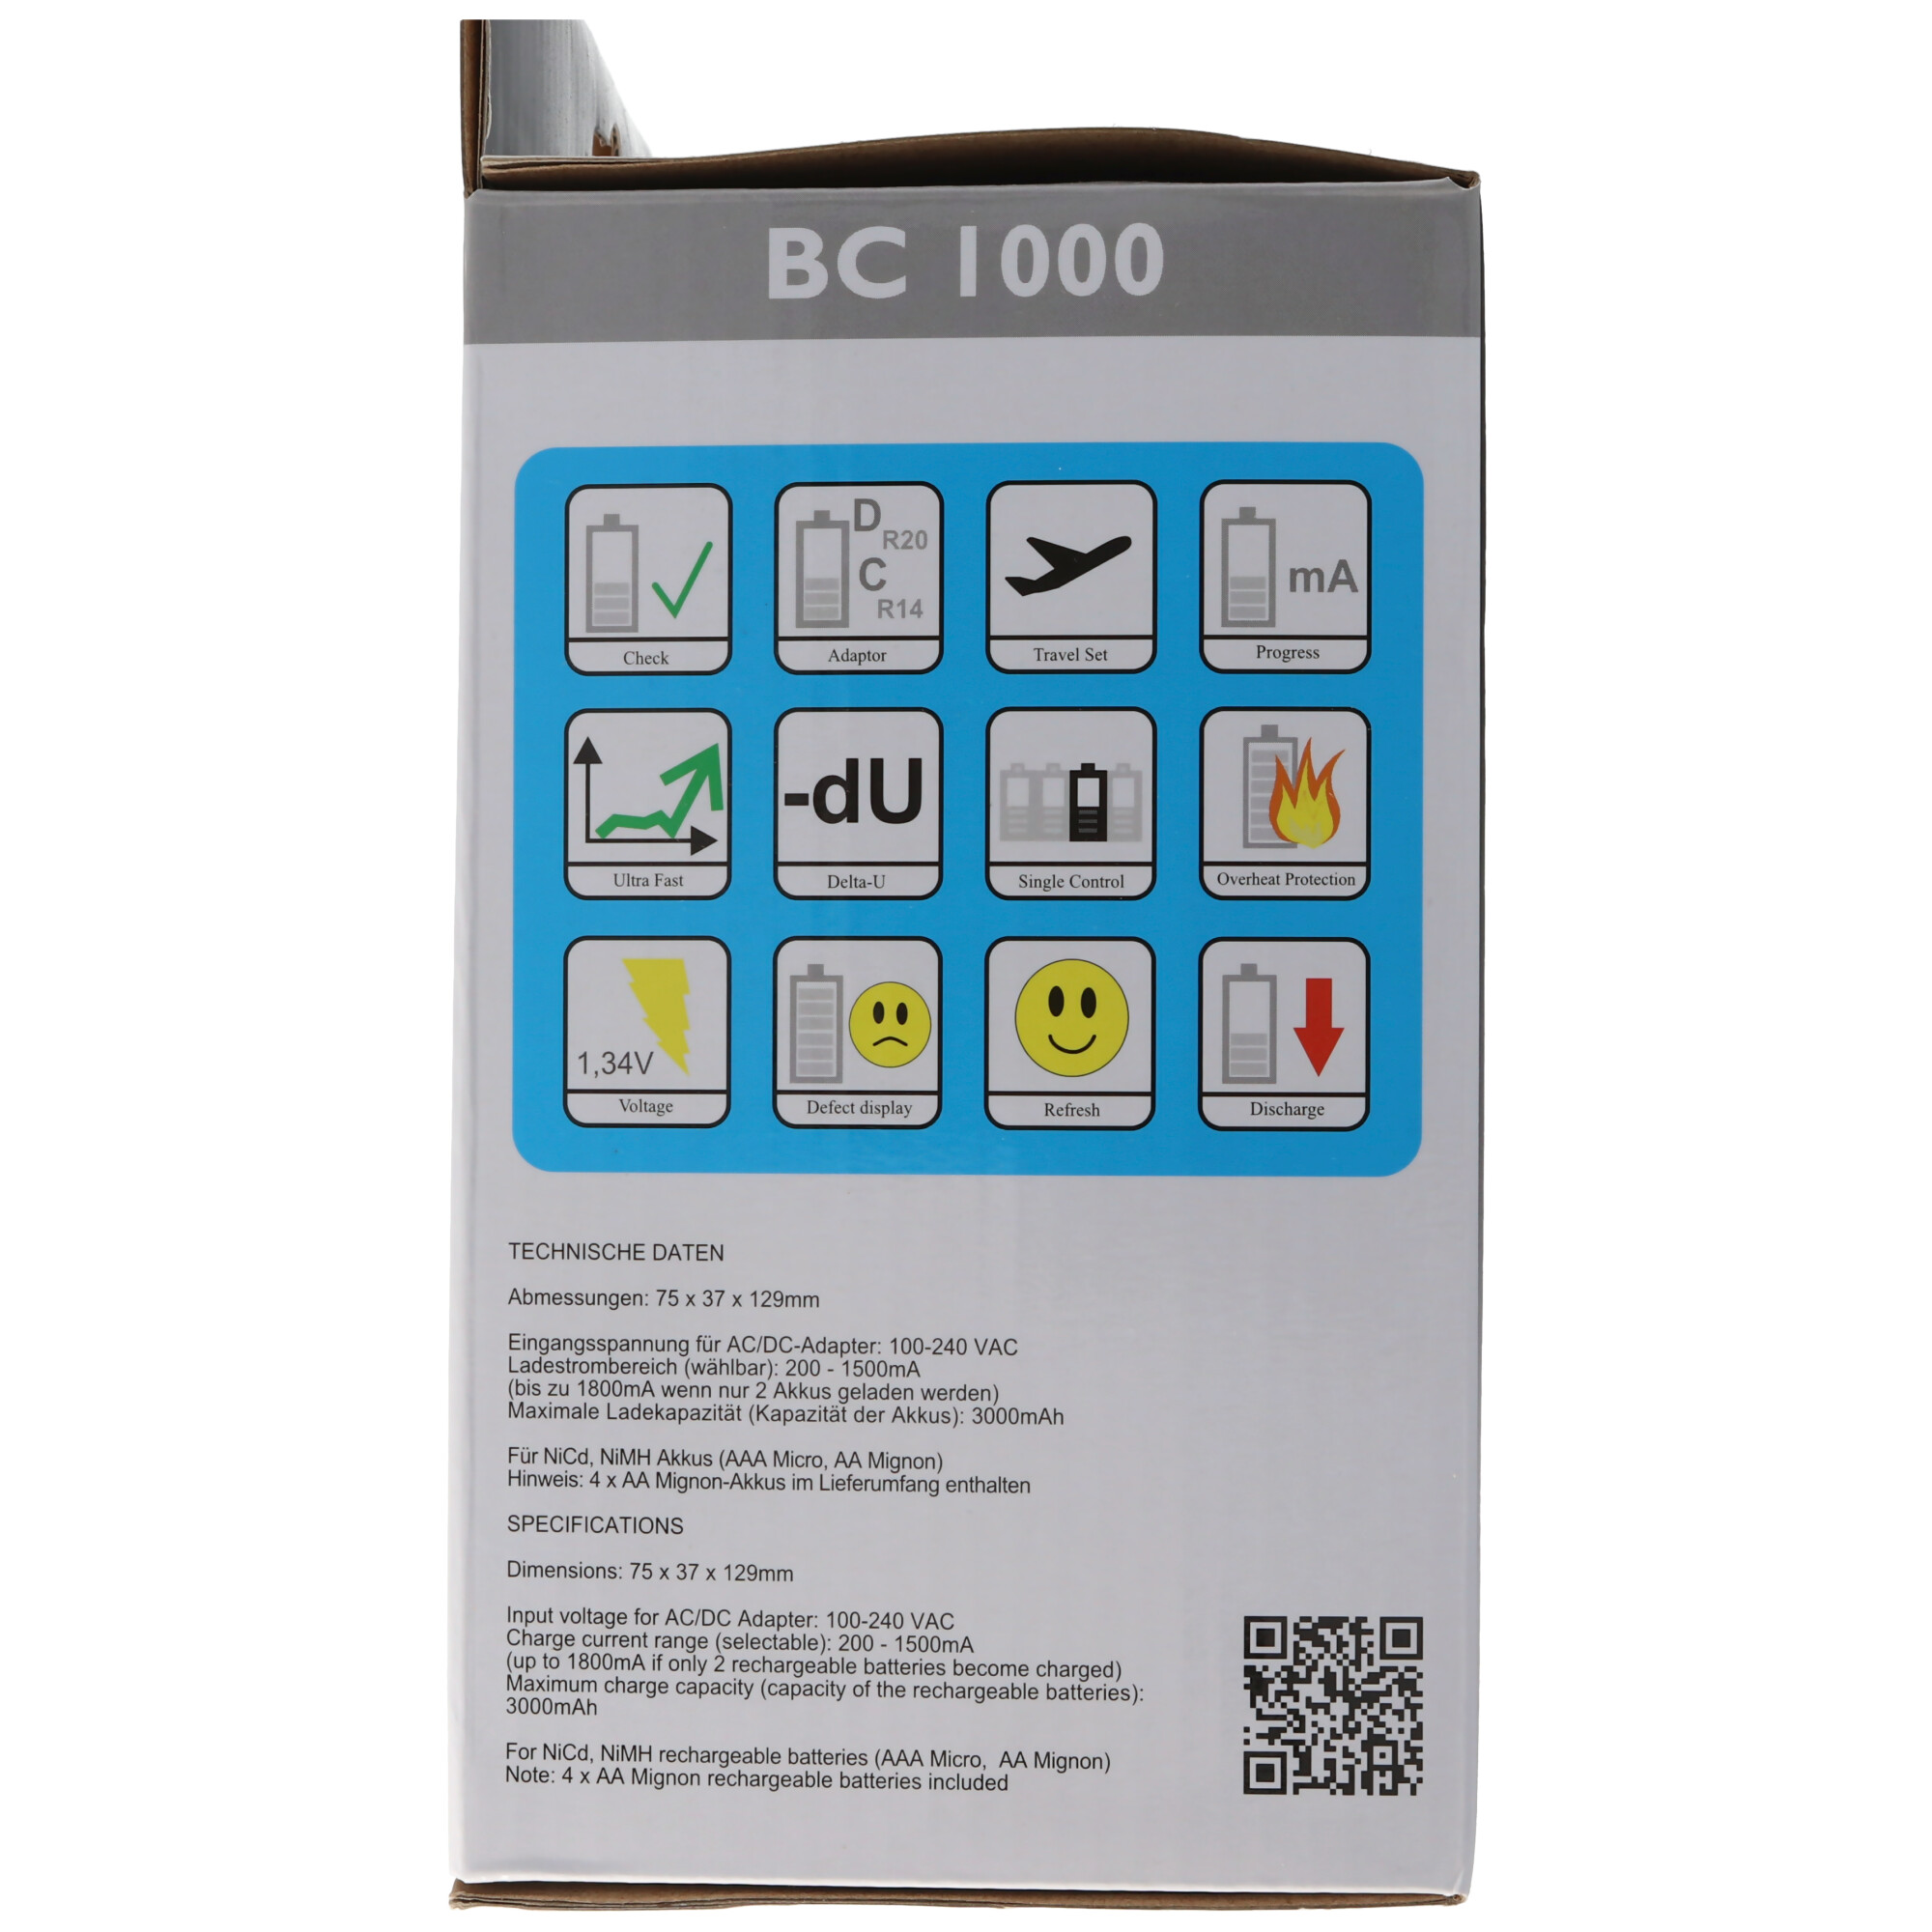 BC900 Schnell Ladegerät mit LCD Display, Entladefunktion